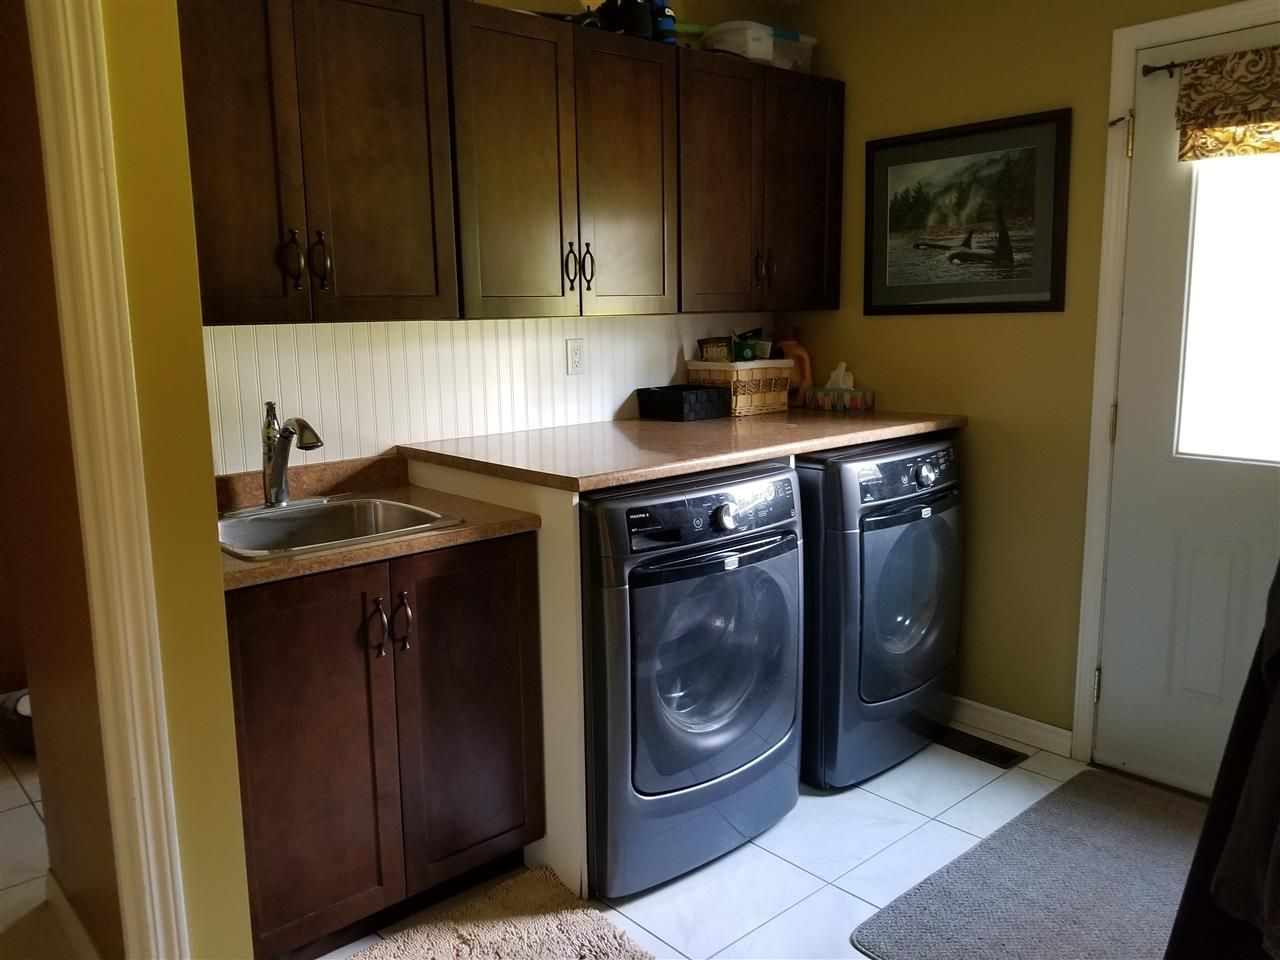 Photo 12: Photos: 511 TAMARACK Road in Williams Lake: Esler/Dog Creek House for sale (Williams Lake (Zone 27))  : MLS®# R2487403